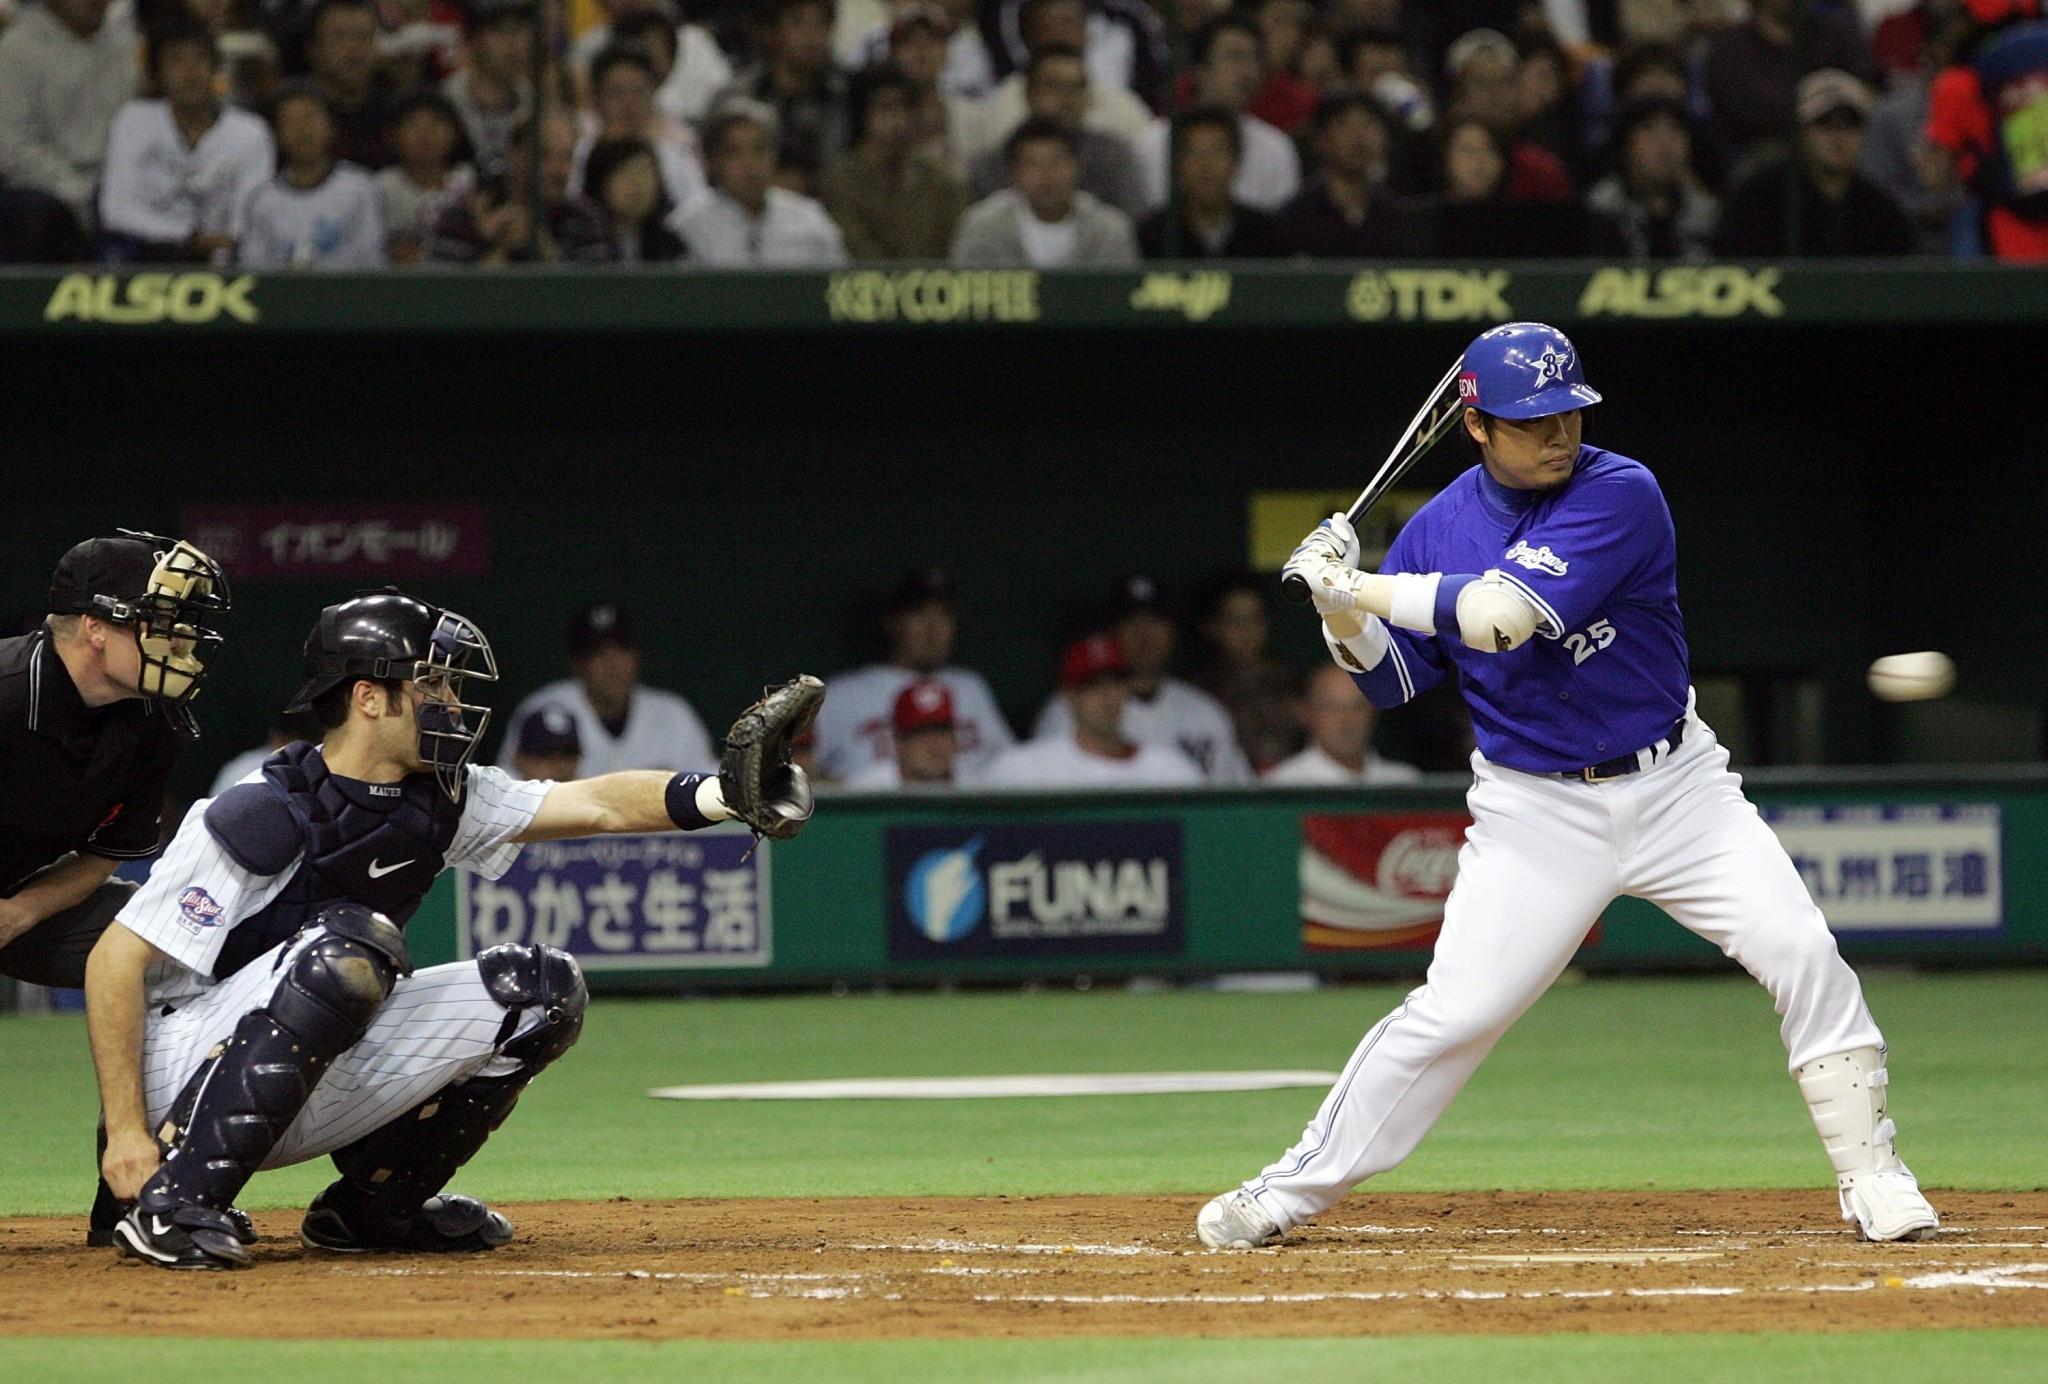 Baseball and softball are taking place at the Yokohama Stadium ©Getty Images